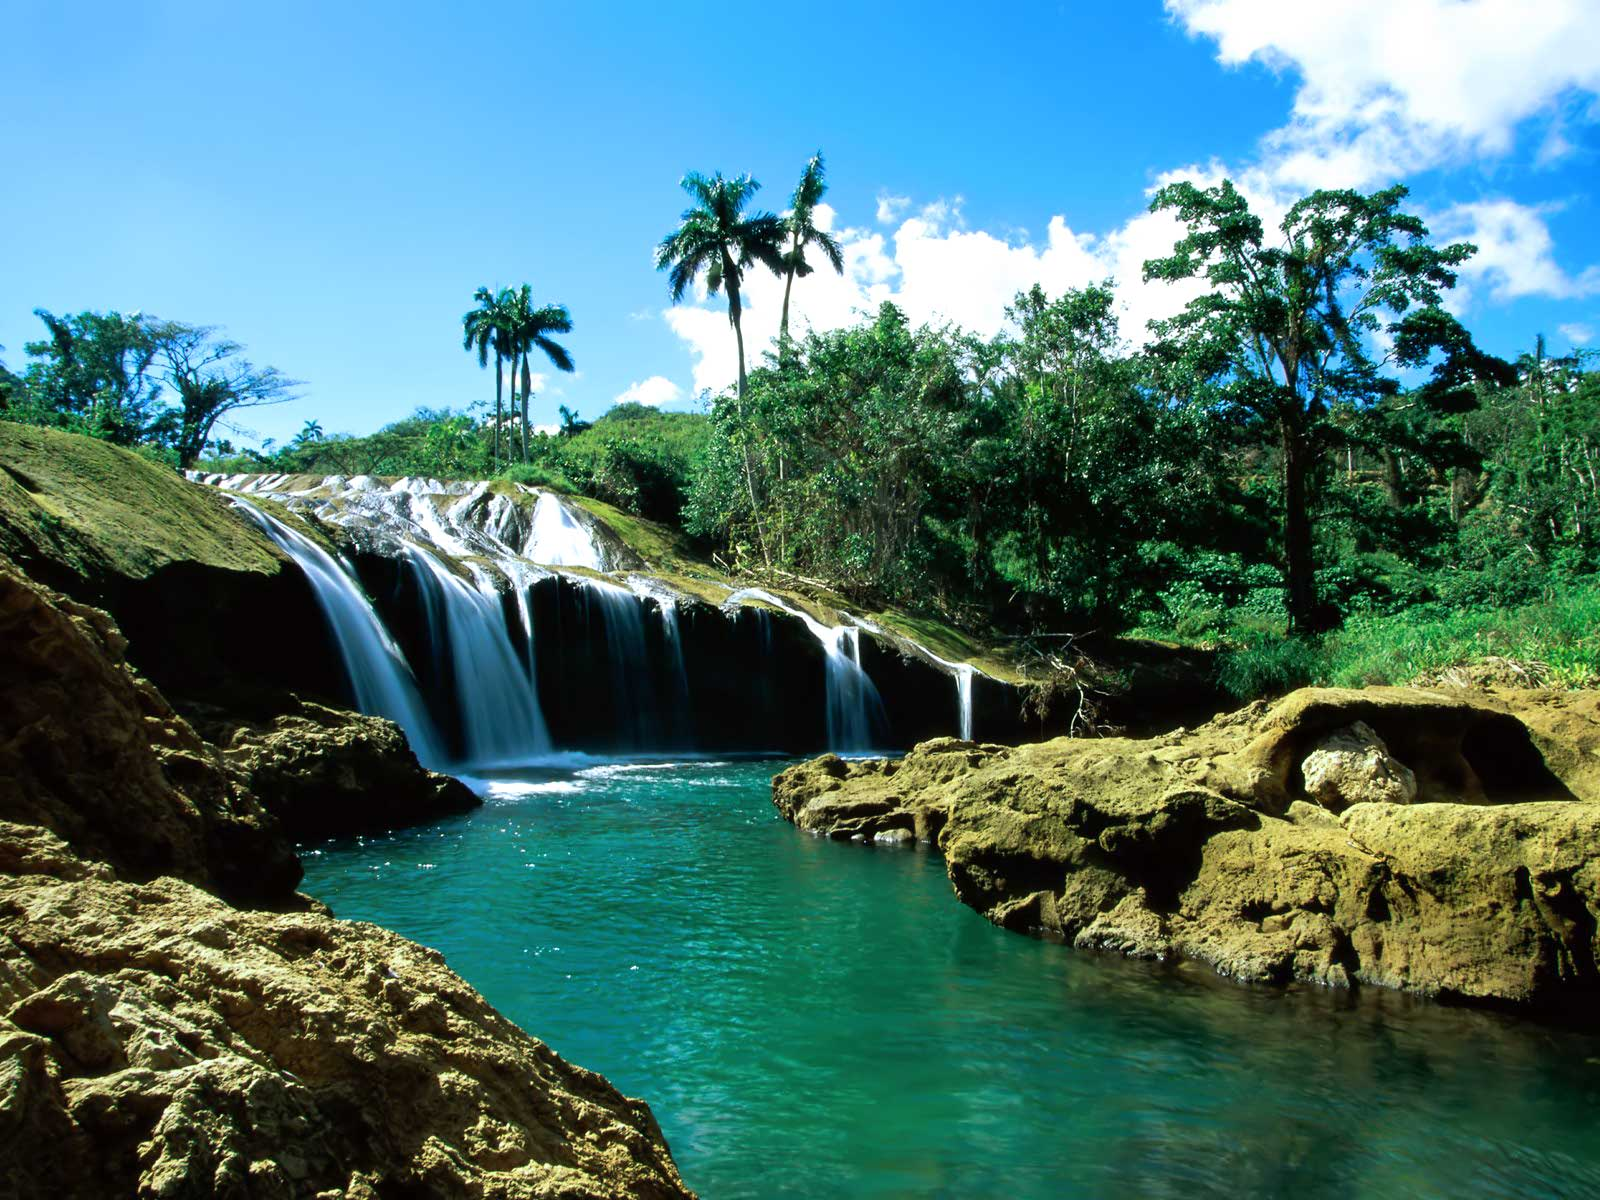 http://3.bp.blogspot.com/-6fY22R3qoDs/TjS7MB653xI/AAAAAAAAKtA/97Wds0Wpjoo/s1600/Wallpapers+Naturaleza+HD+-+76+-+2.jpg